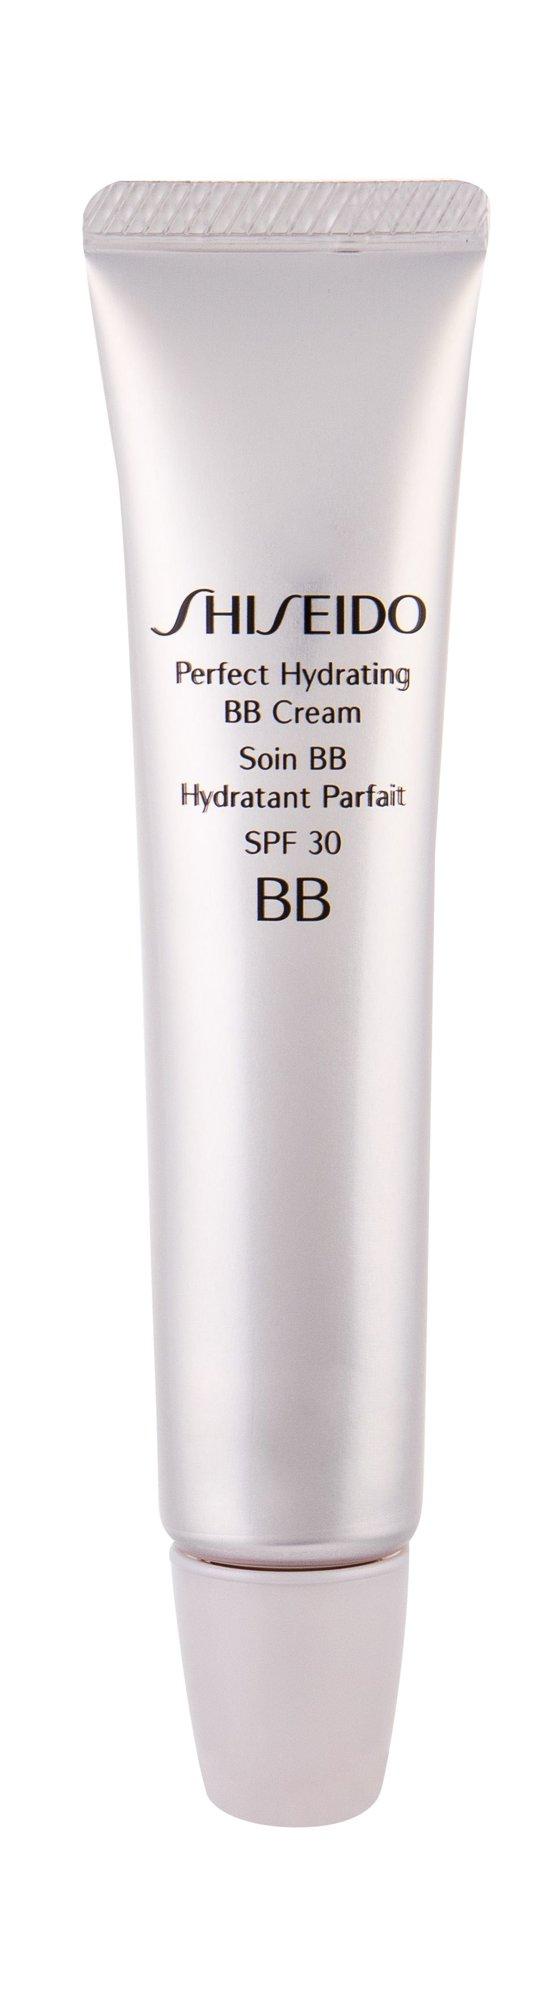 Shiseido Perfect Hydrating BB Cream 30ml Light